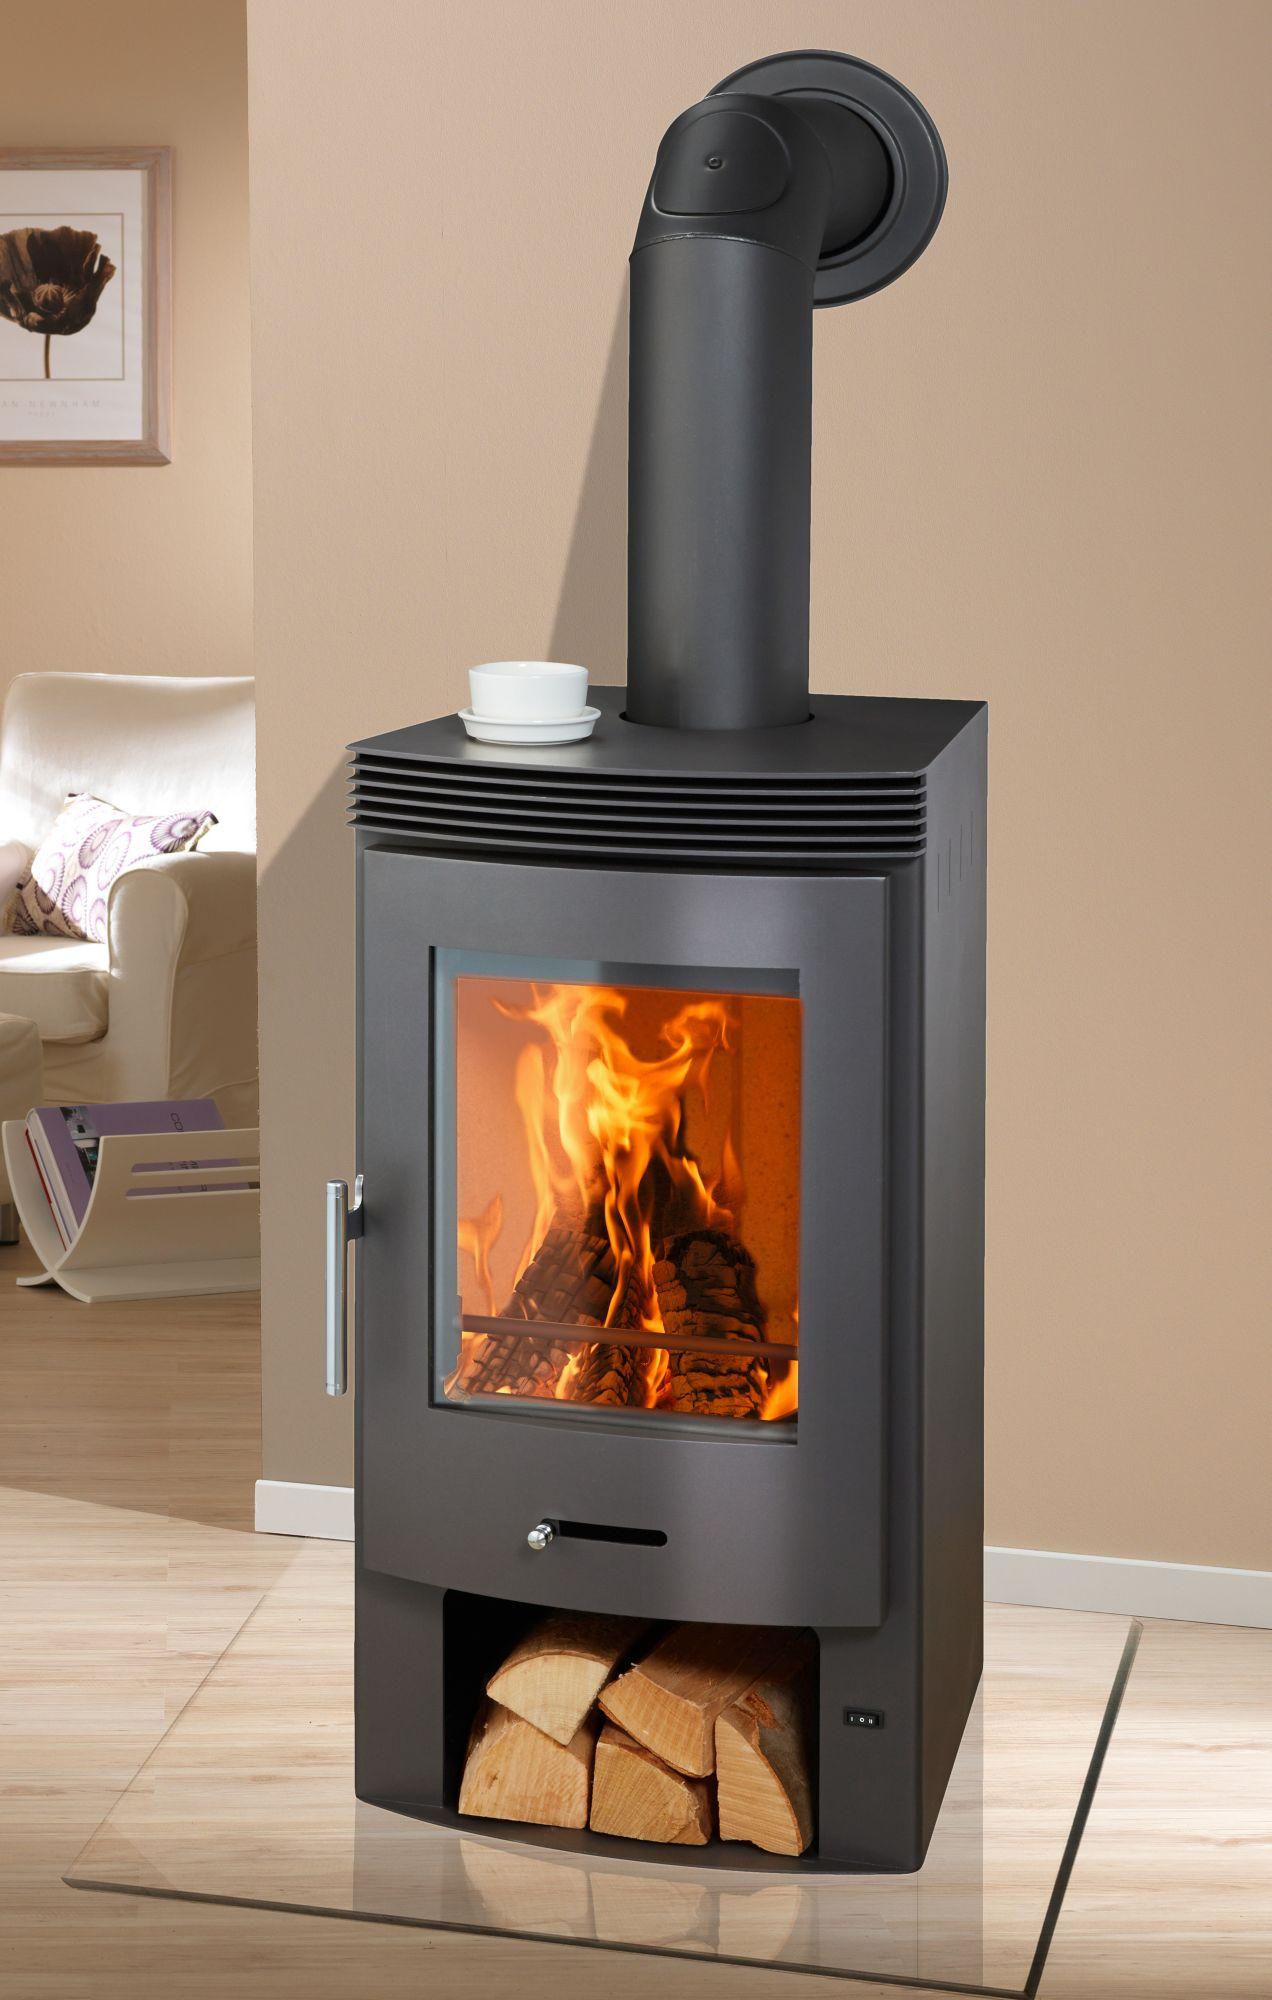 kaminofen bergen stahl 7 4 kw mit integr ventilator. Black Bedroom Furniture Sets. Home Design Ideas